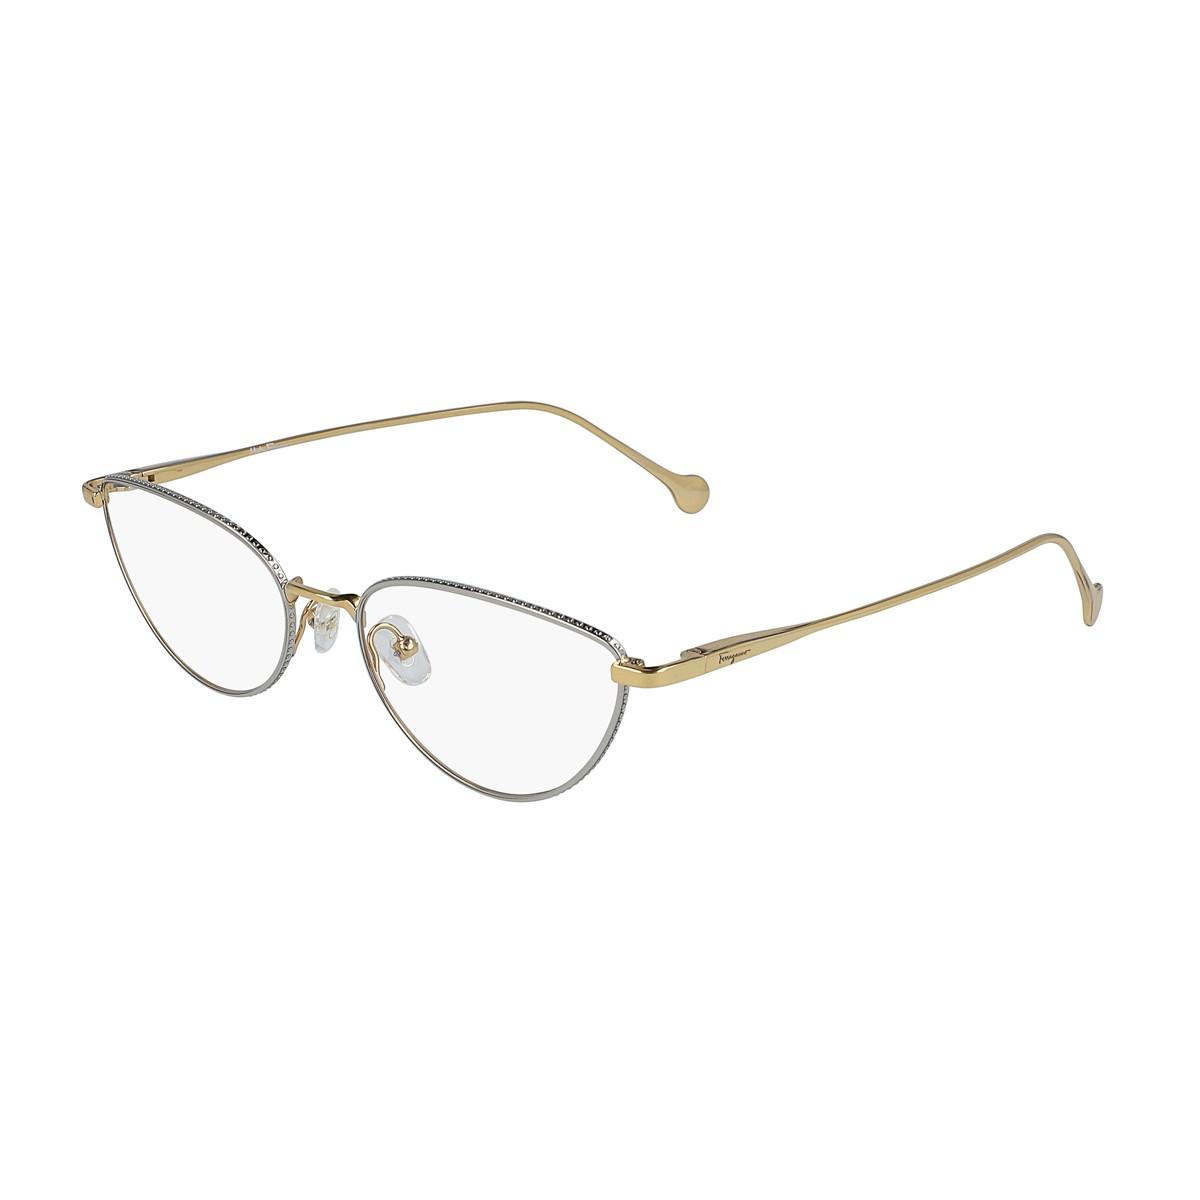 Salvatore Ferragamo SF2188 | Women's eyeglasses